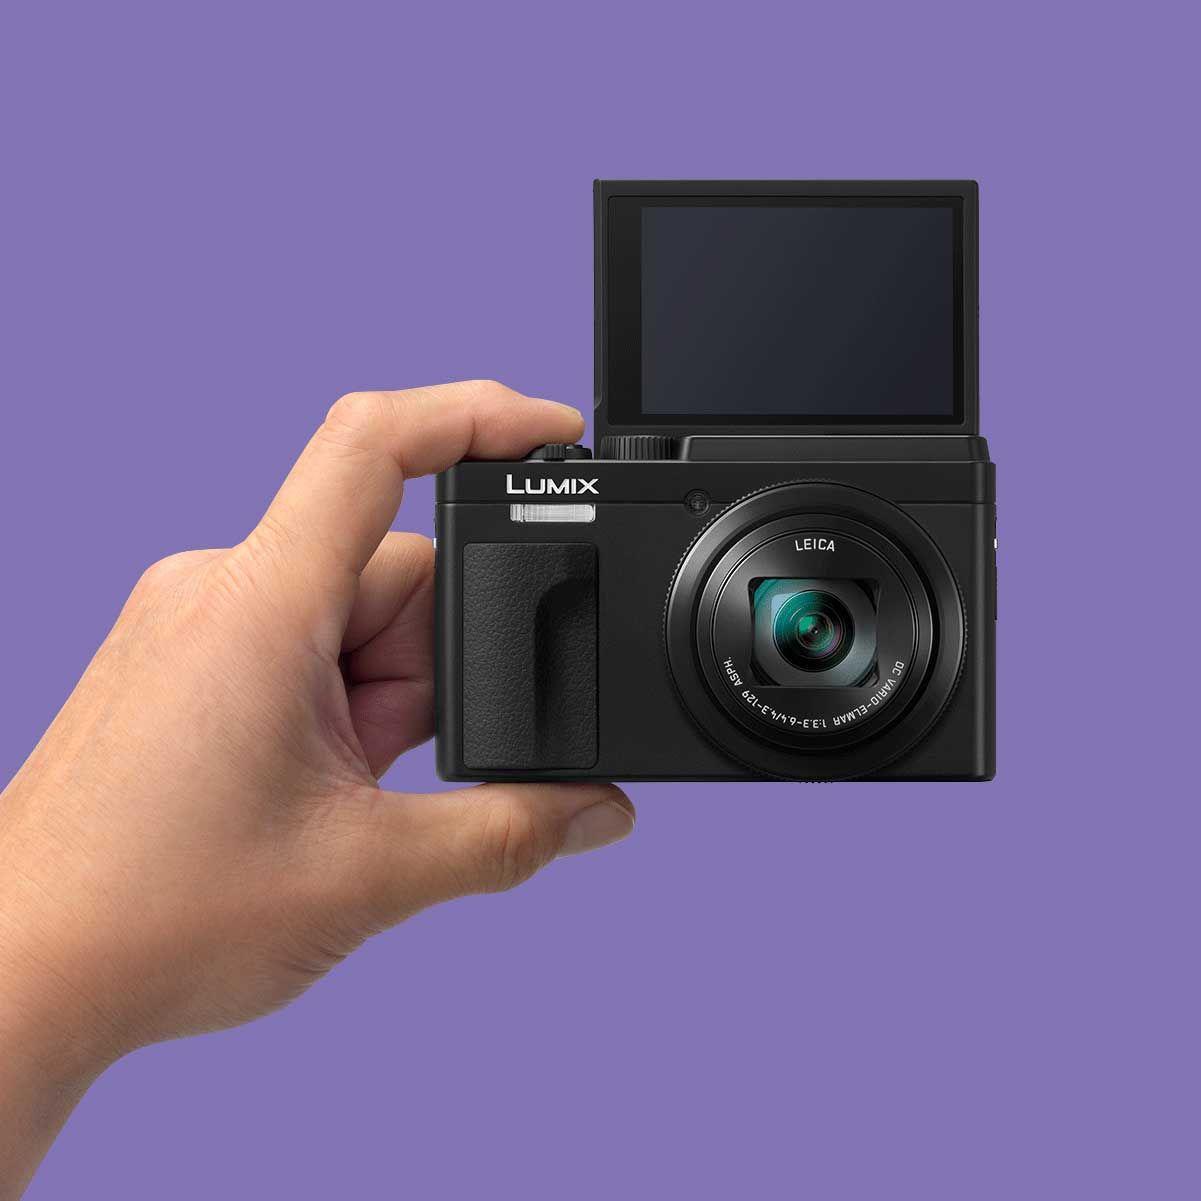 Panasonic Lumix TZ95 review: a compact camera perfect for travel